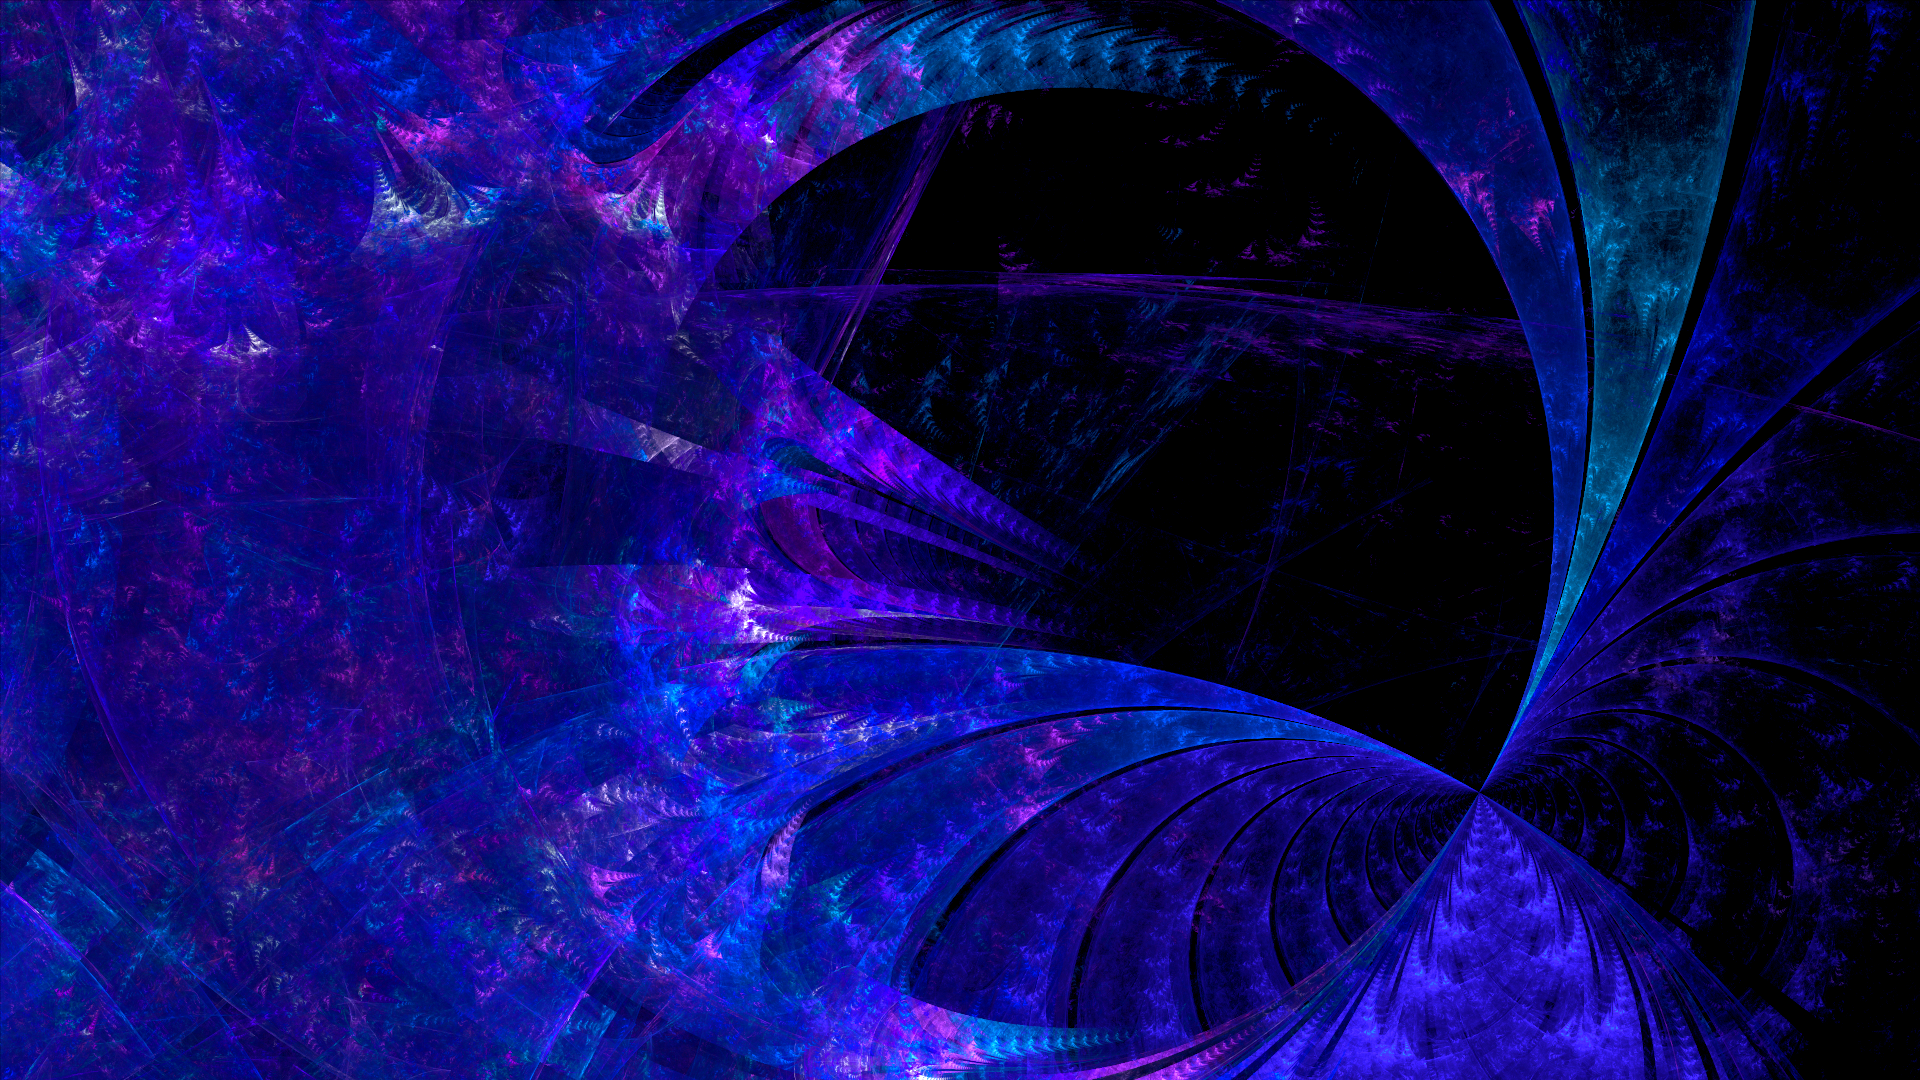 Purple Haze Hole by Fractamonium